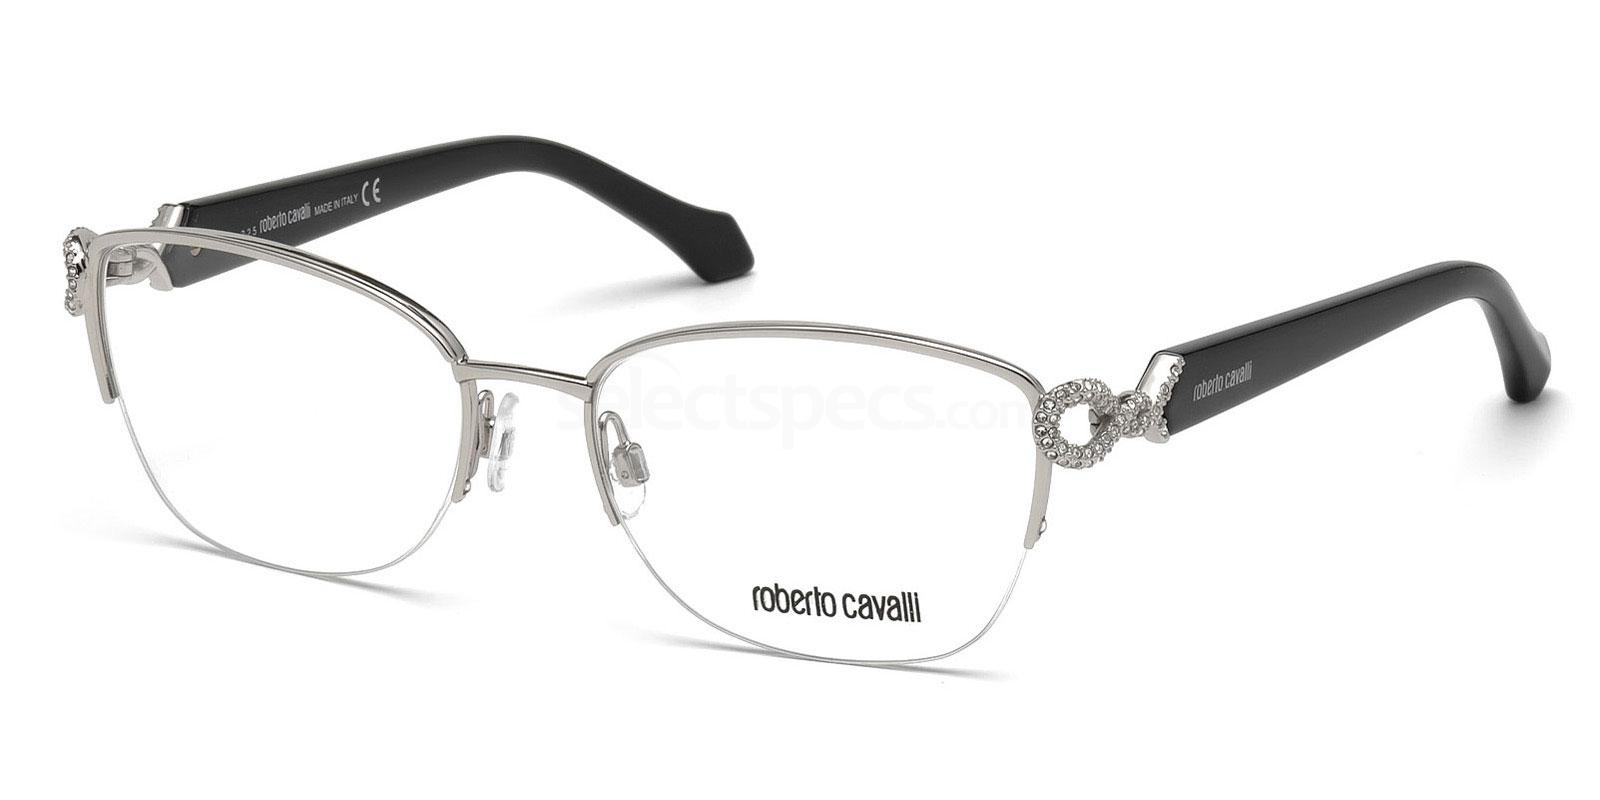 016 RC5018 , Roberto Cavalli